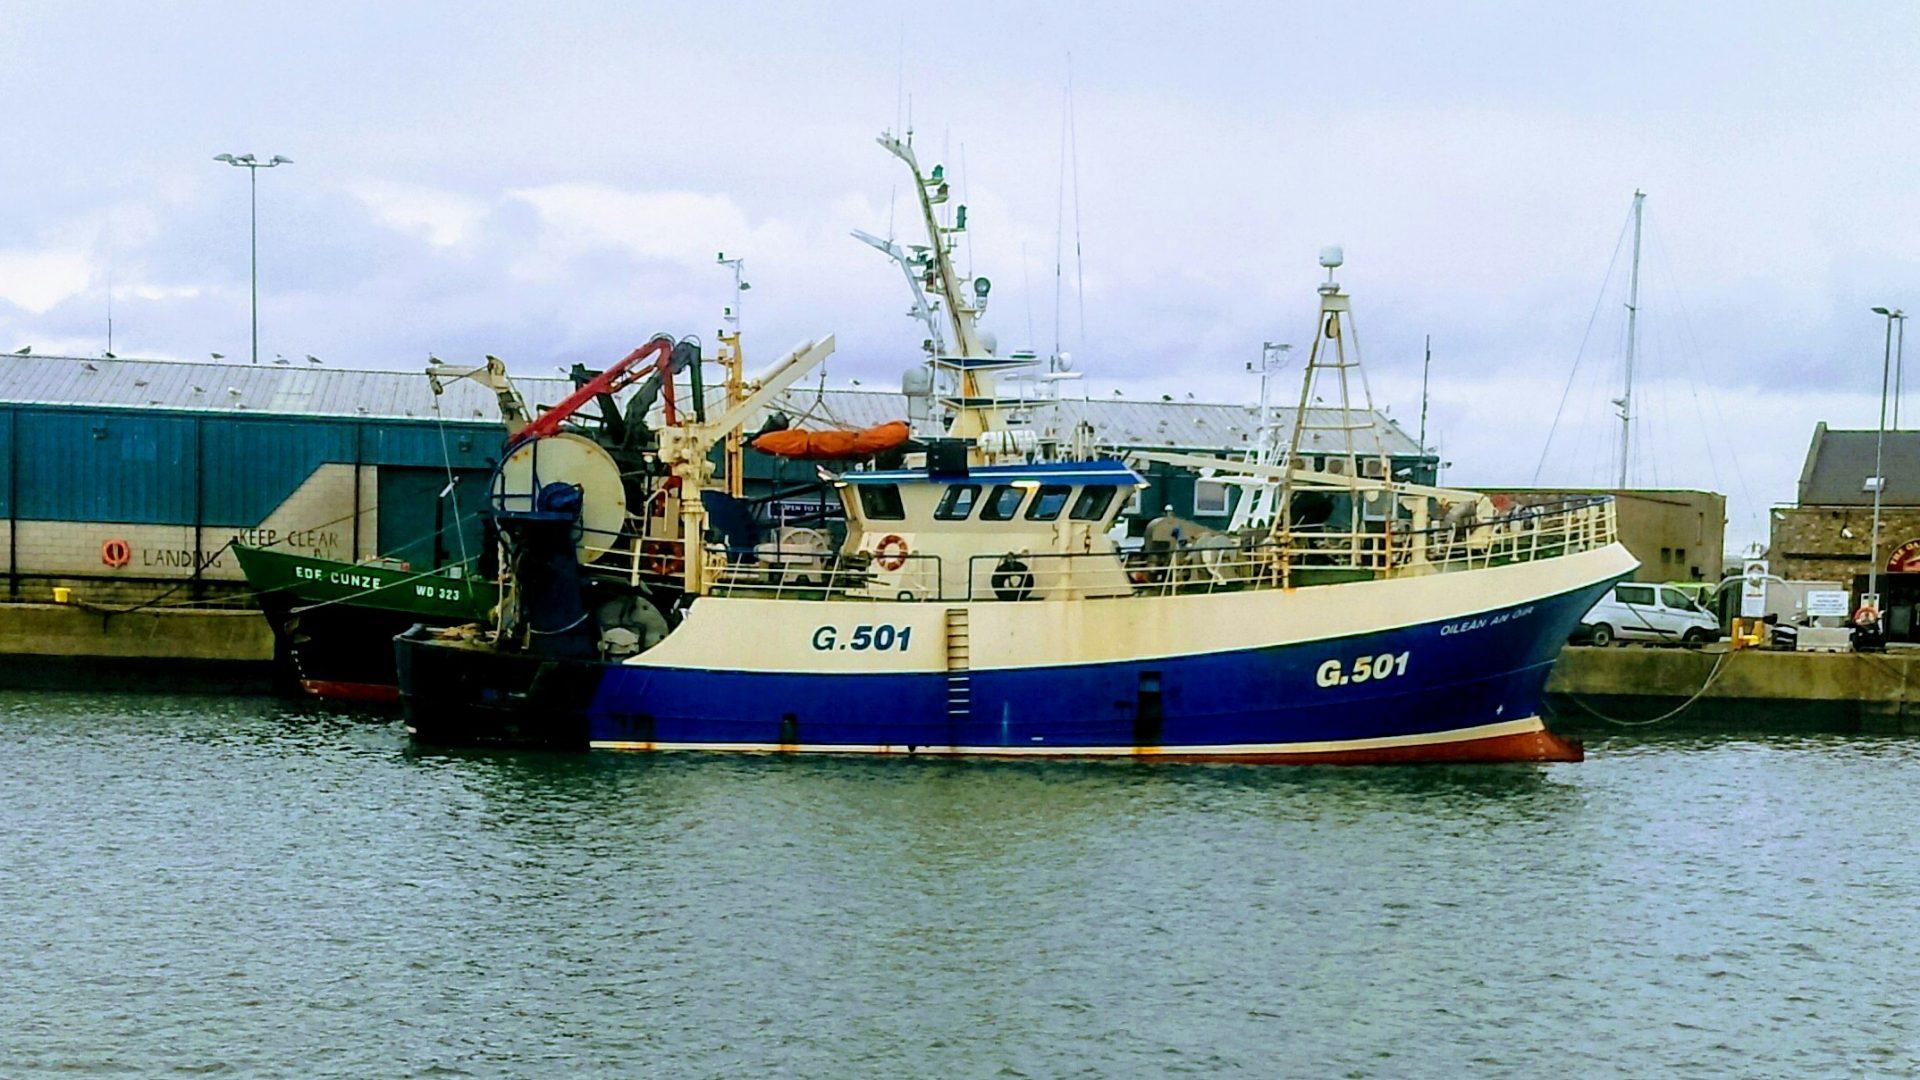 Irish Marine Safety